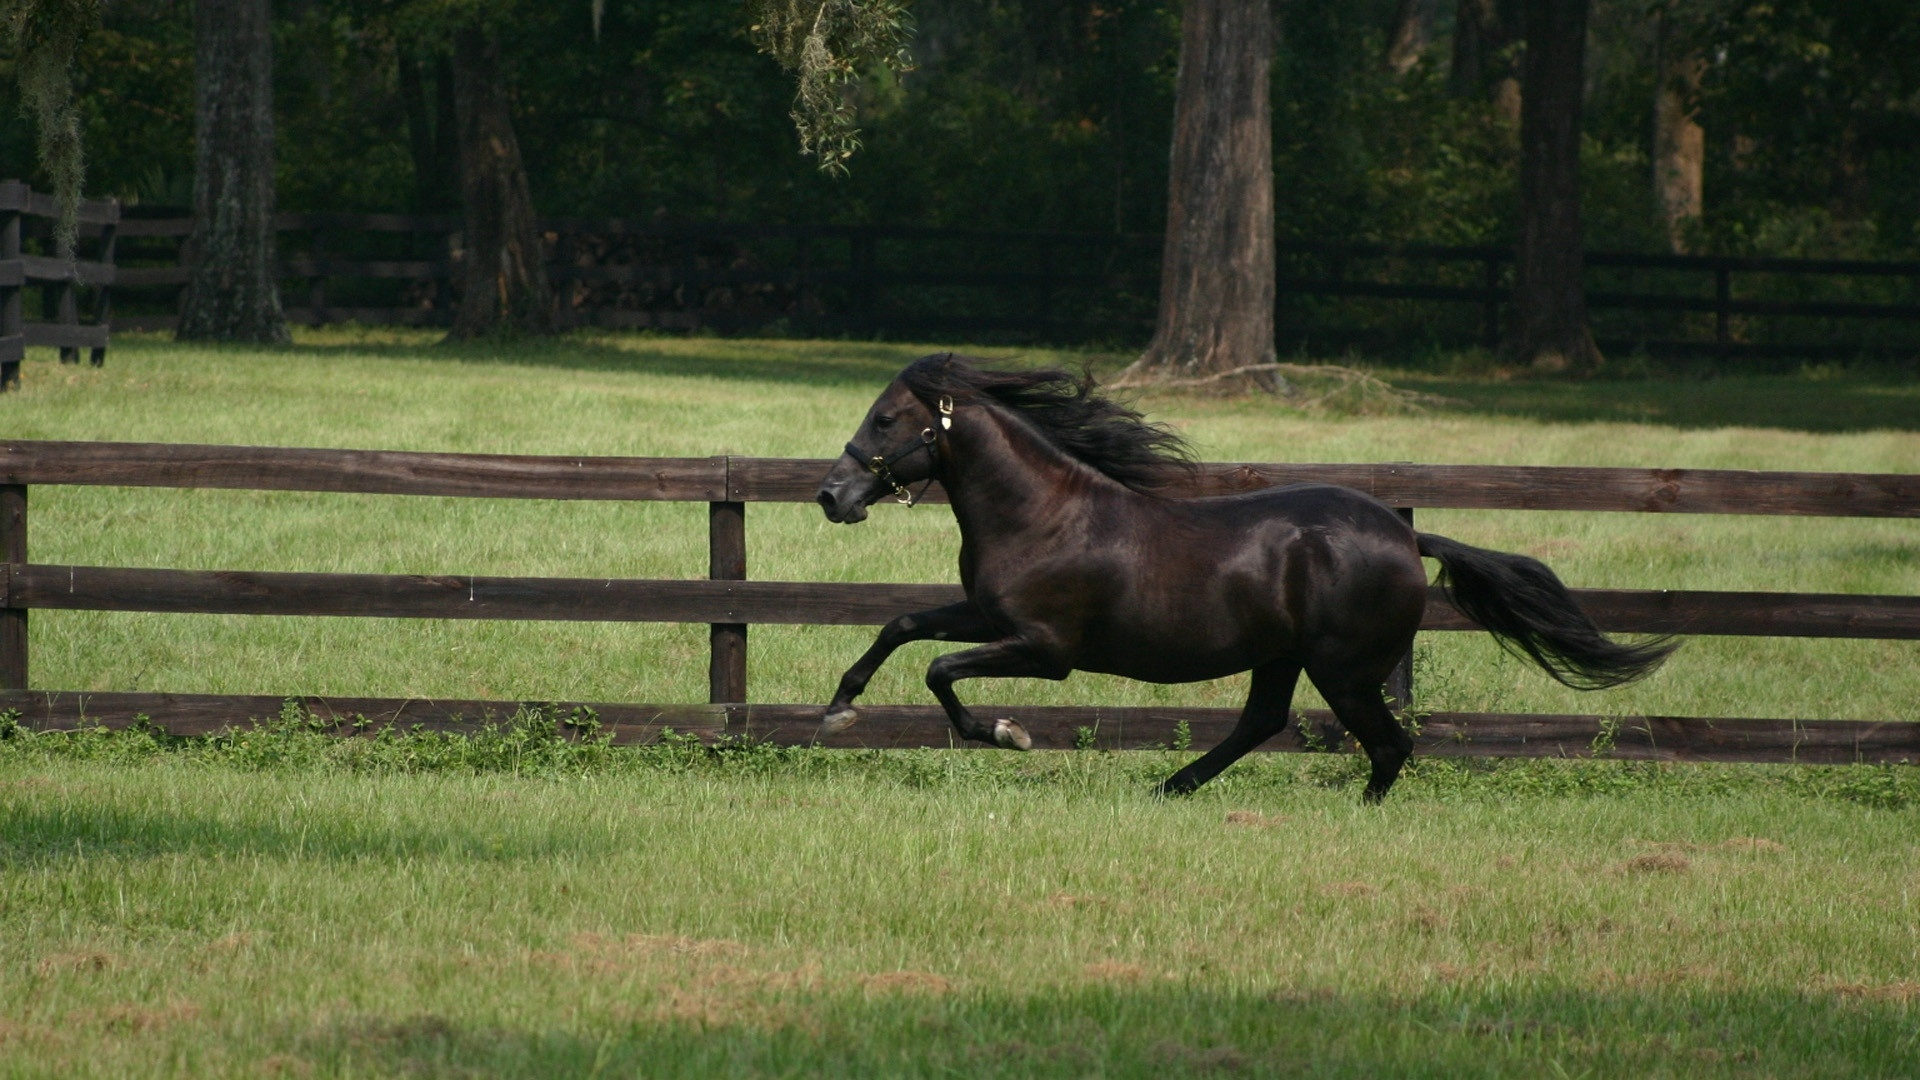 Black Horse pc wallpaper